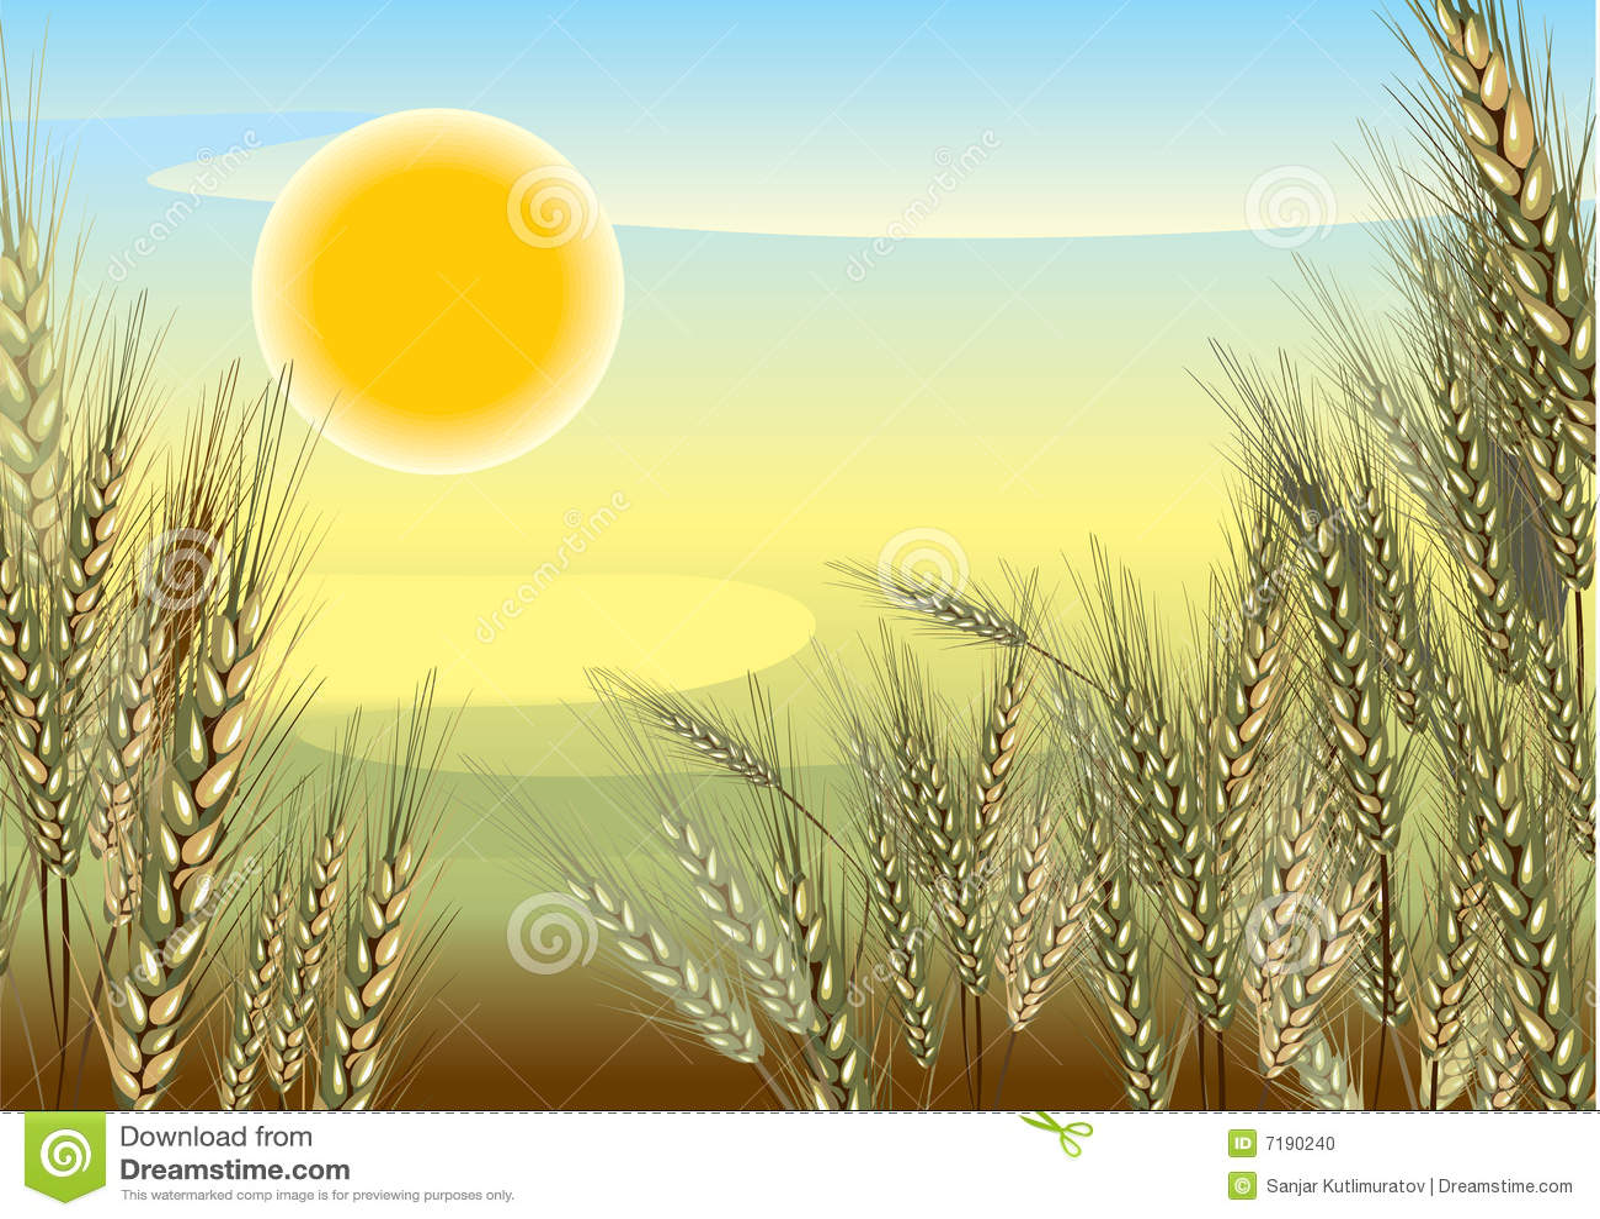 Agriculture.Landscape